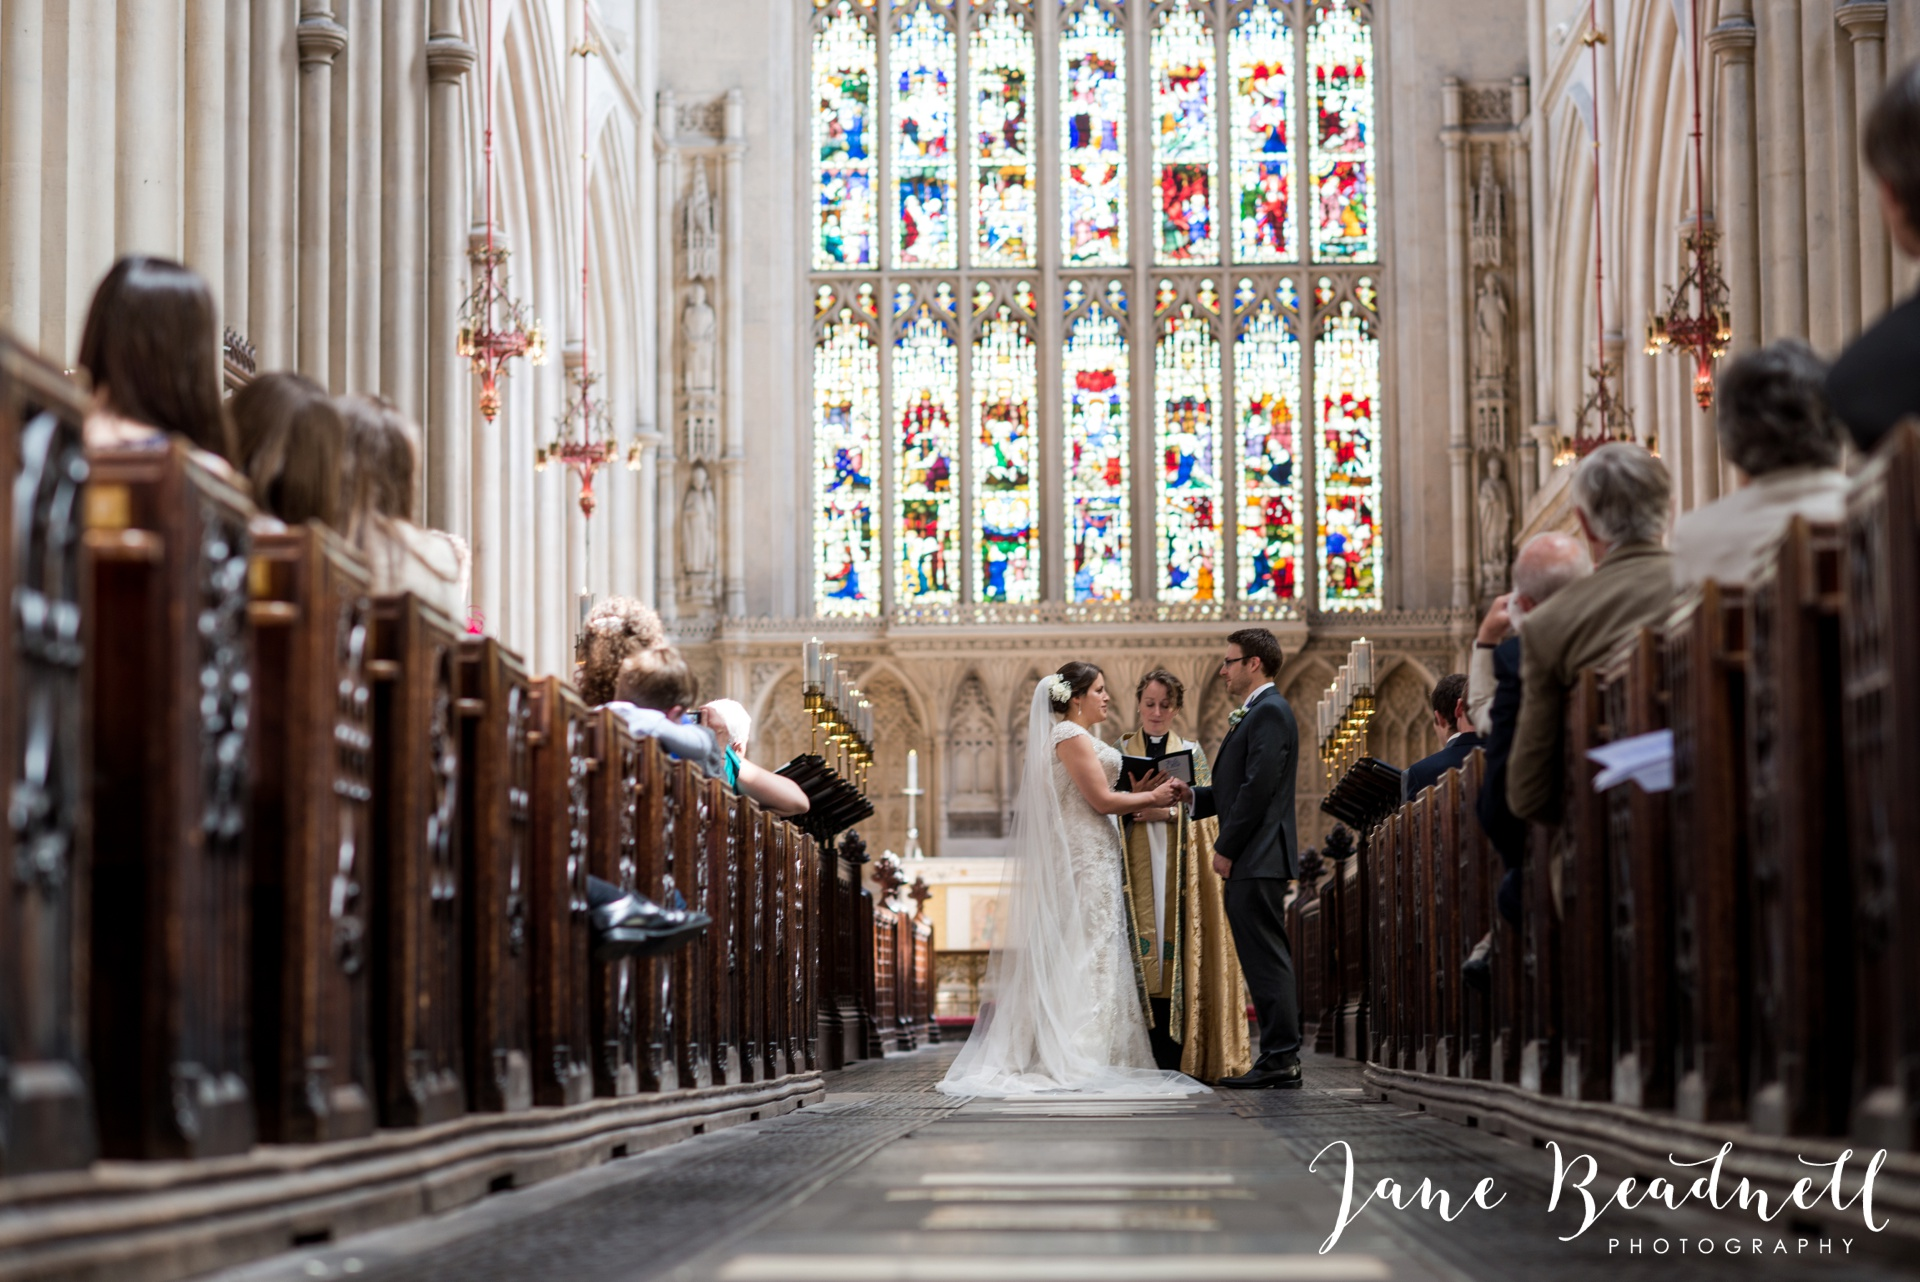 Bath Abbey wedding photography by fine art wedding photographer Leeds Jane Beadnell_15